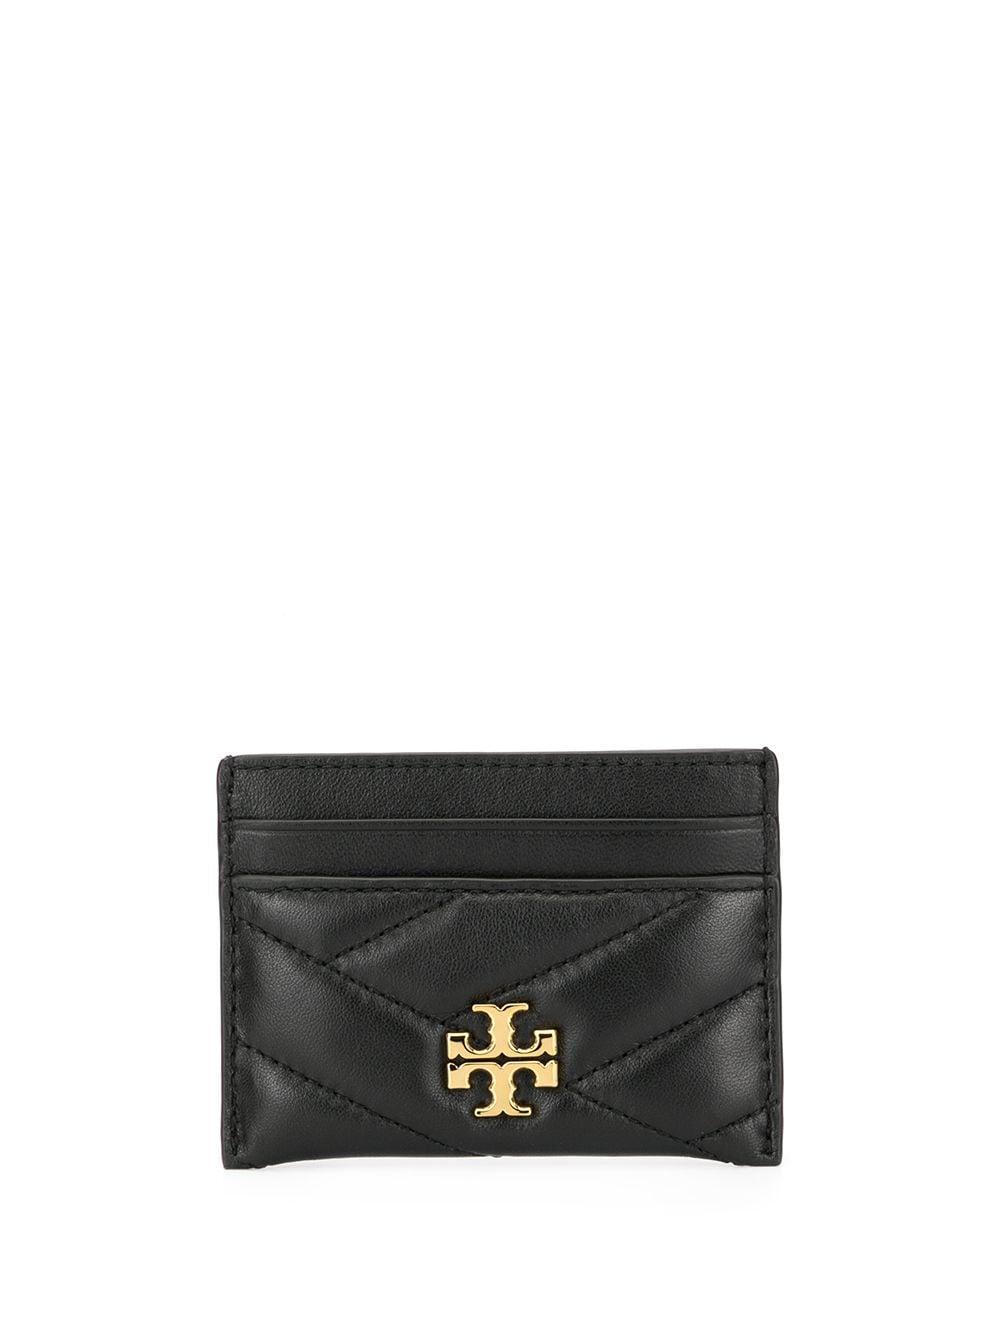 Kira Leather Card Case